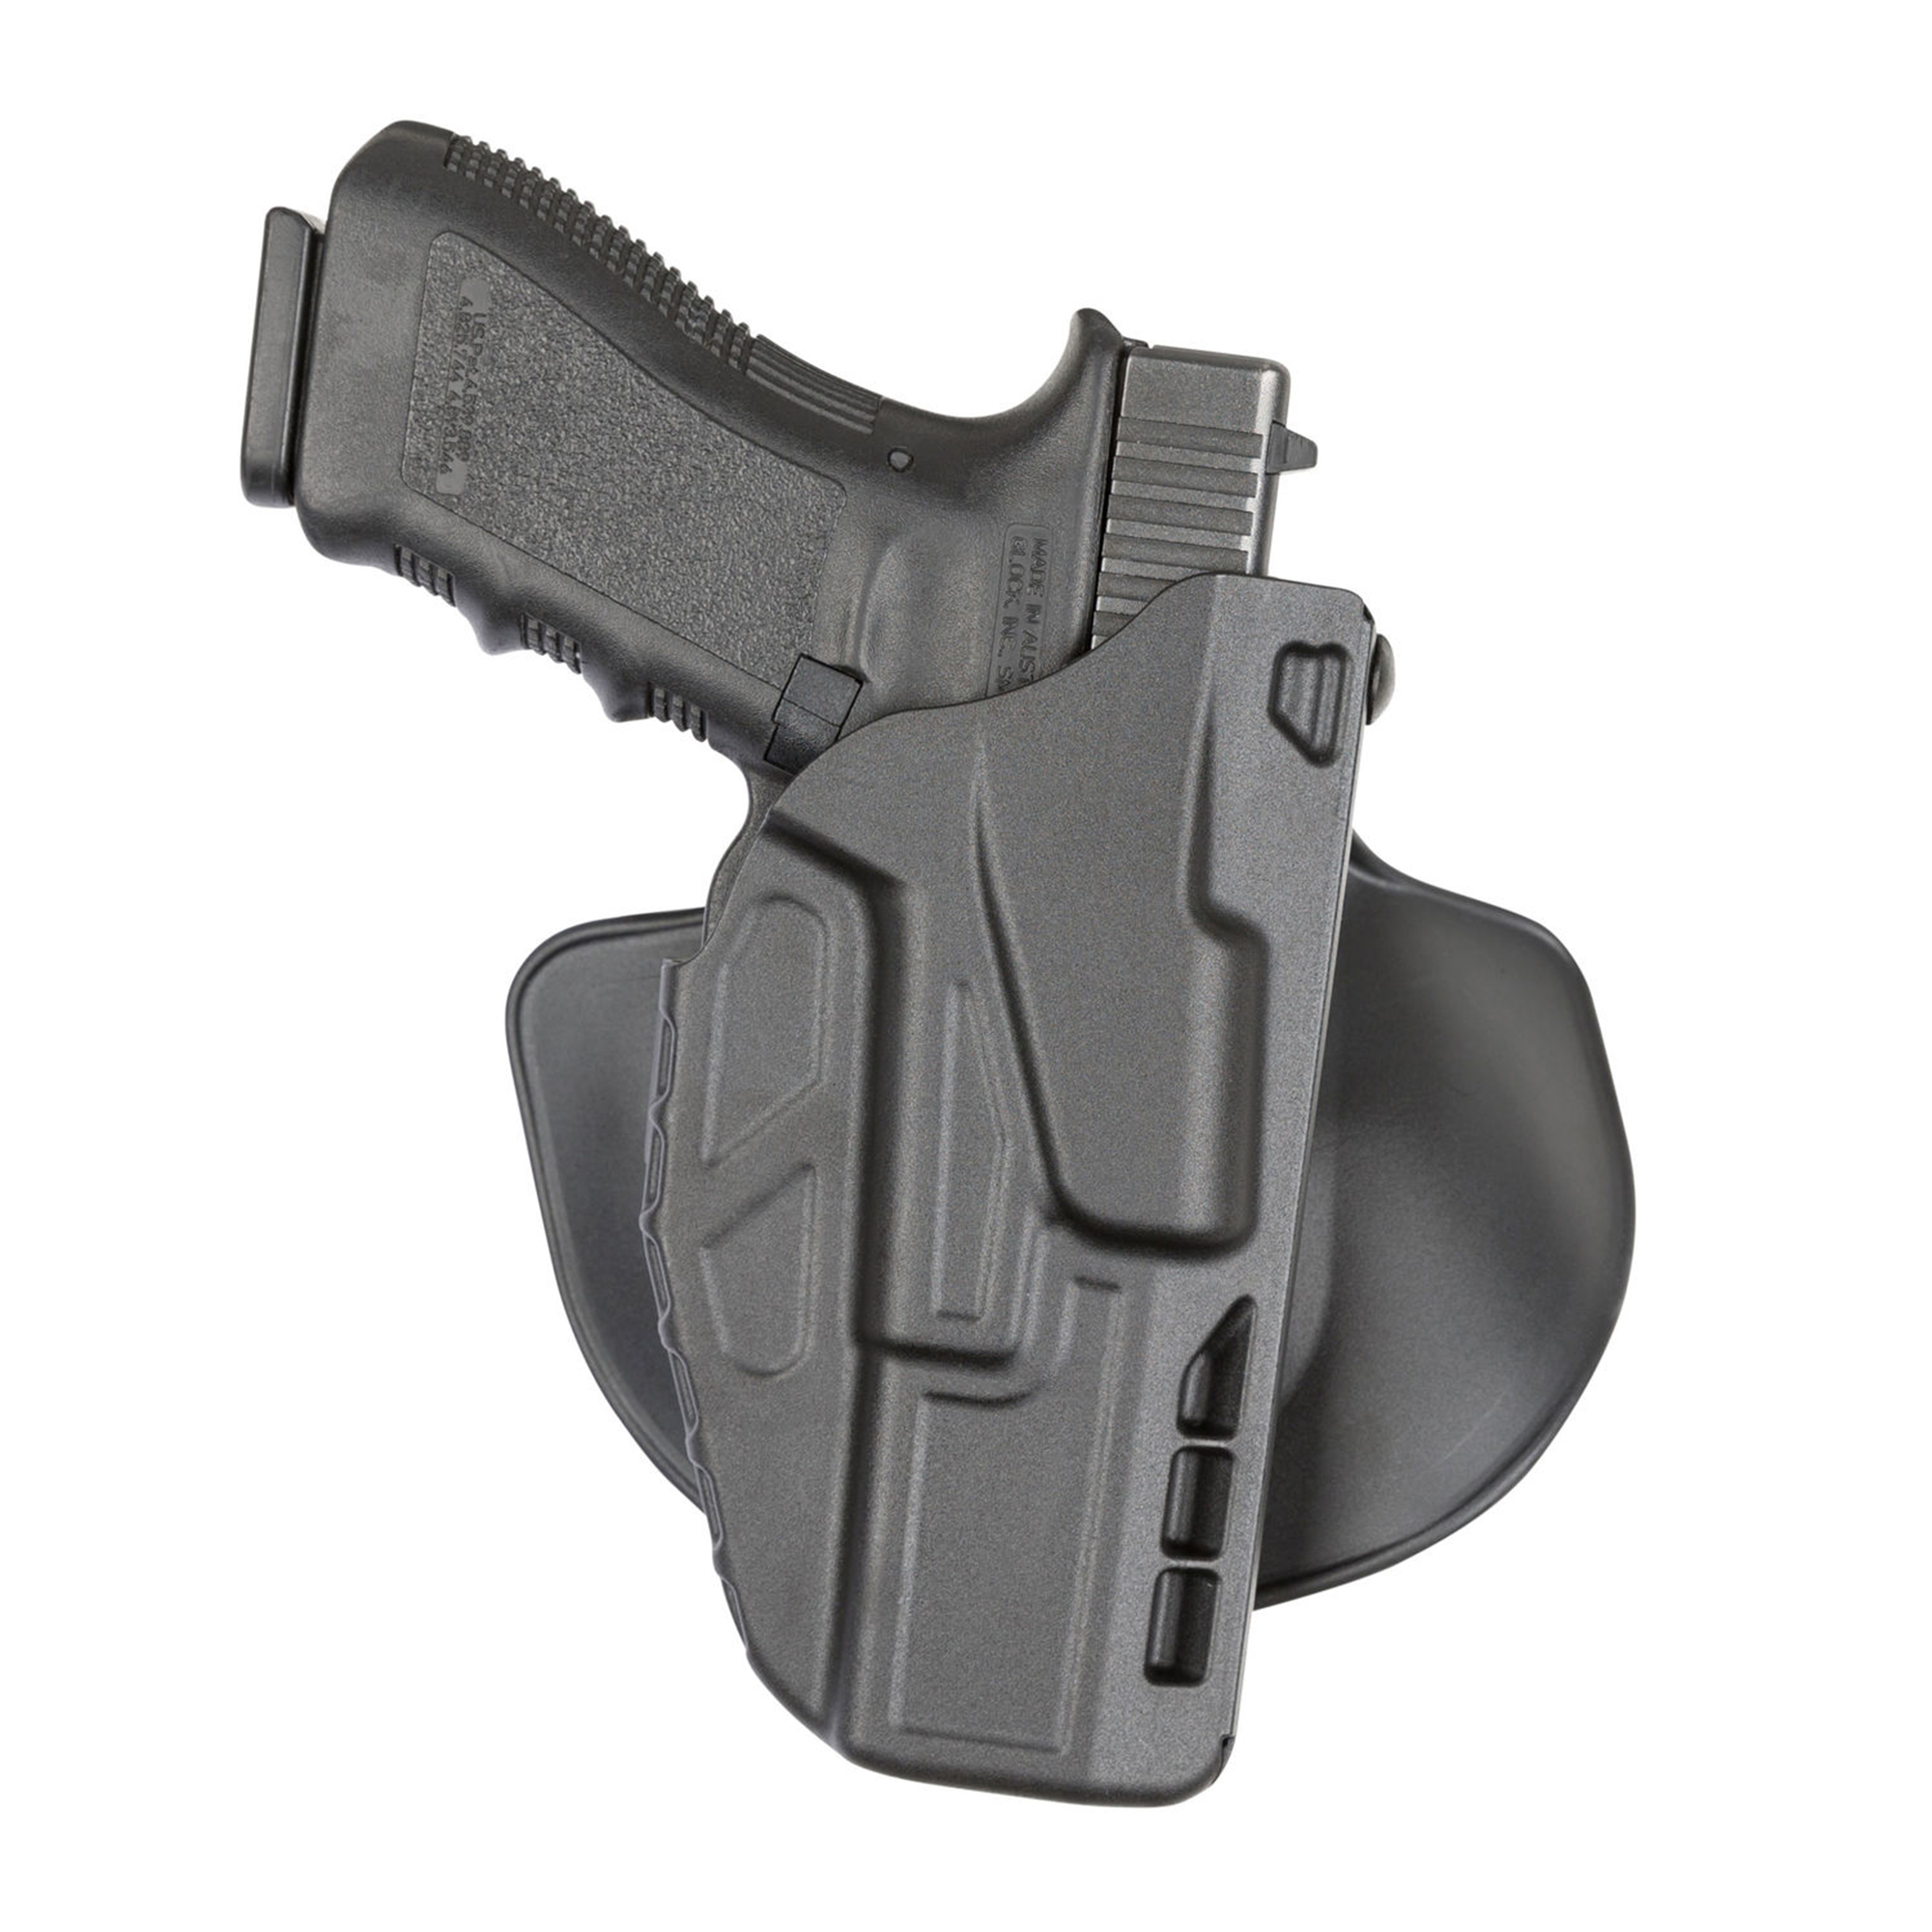 Safariland Model 7378 7TS ALS Open Top Concealment Paddle Holster, Glock 17